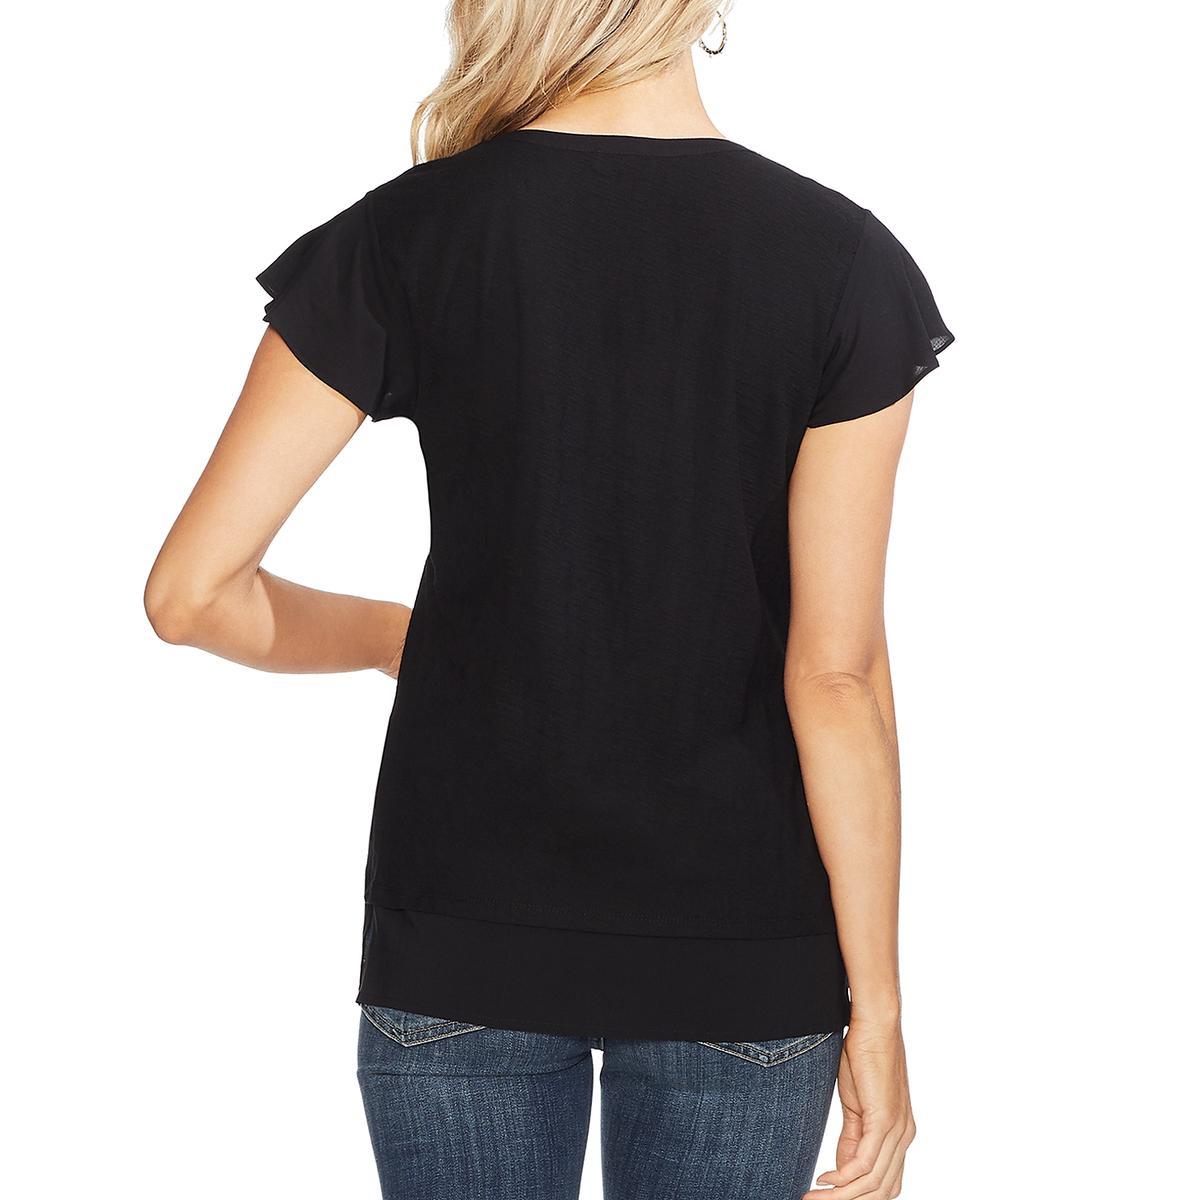 Vince Camuto Womens Cotton Slub Flutter Sleeves T-Shirt Top BHFO 7444